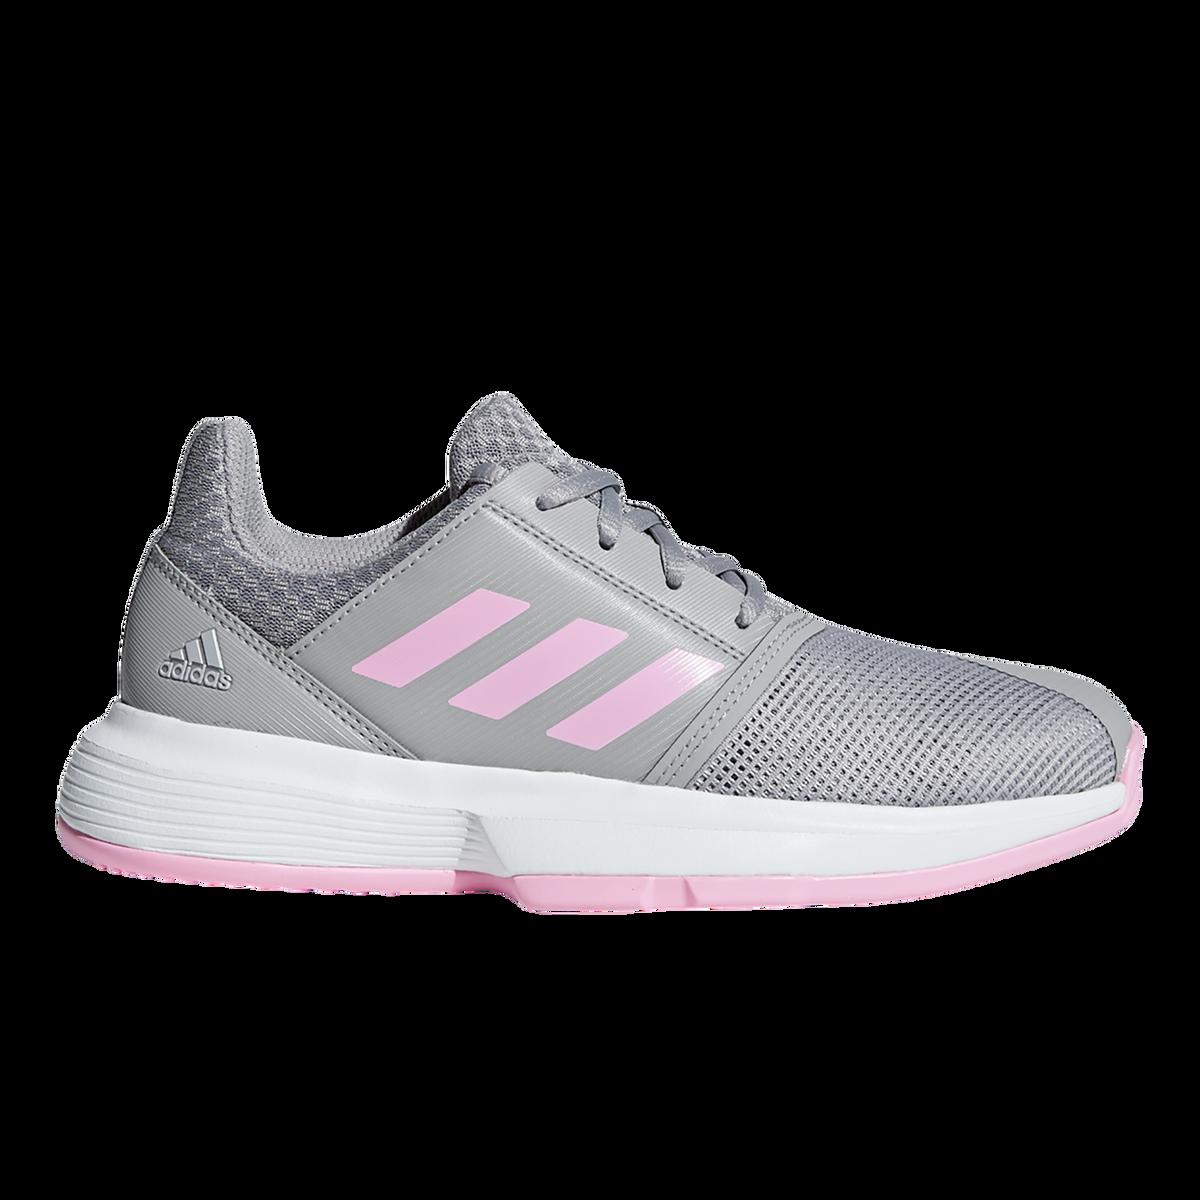 8c7ce5d20 Courtjam XJ Kids Tennis Shoe - Grey/Pink